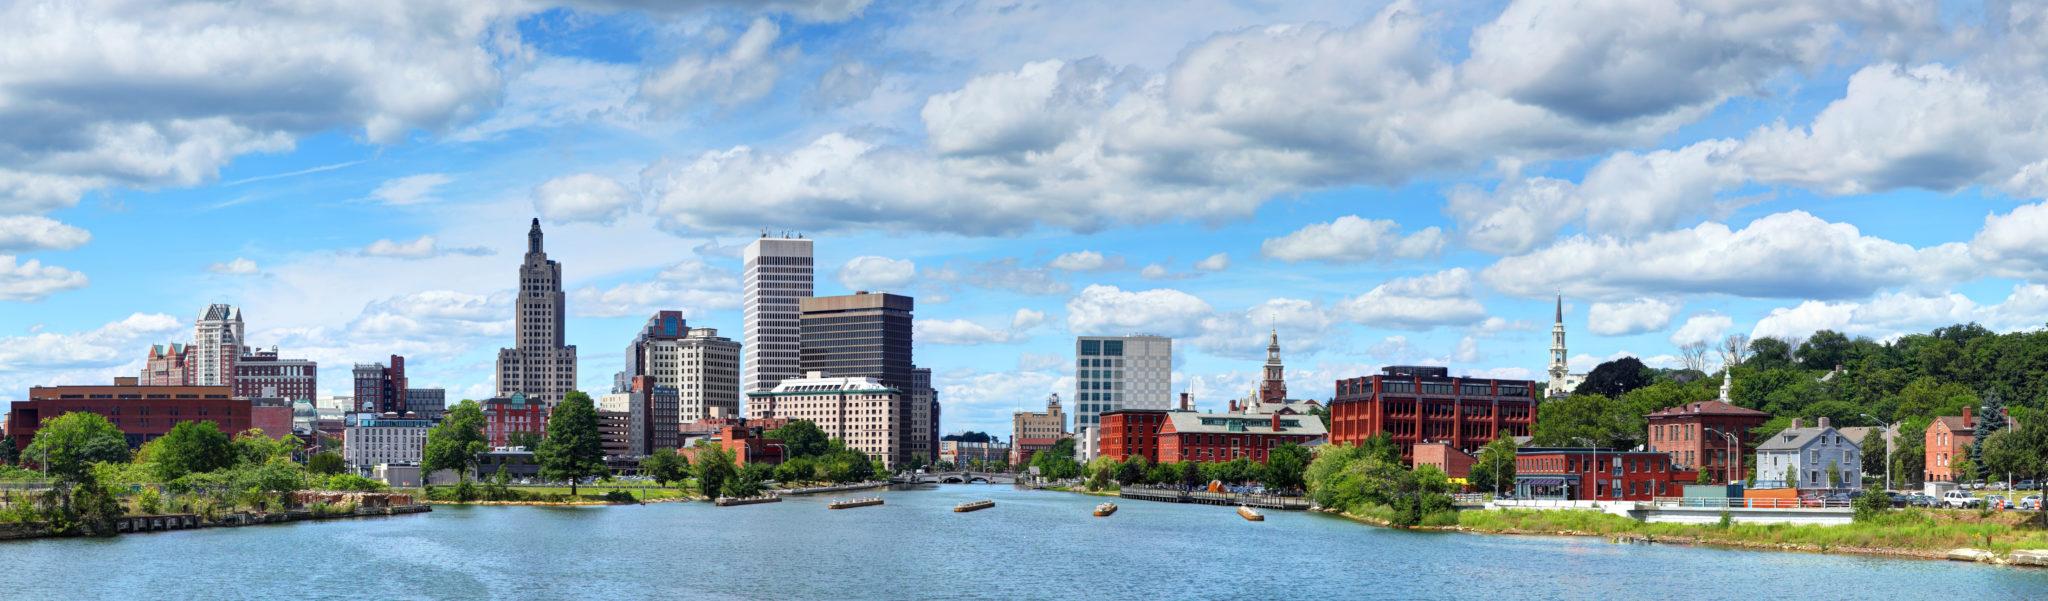 Providence, Rhode Island Skyline Panorama